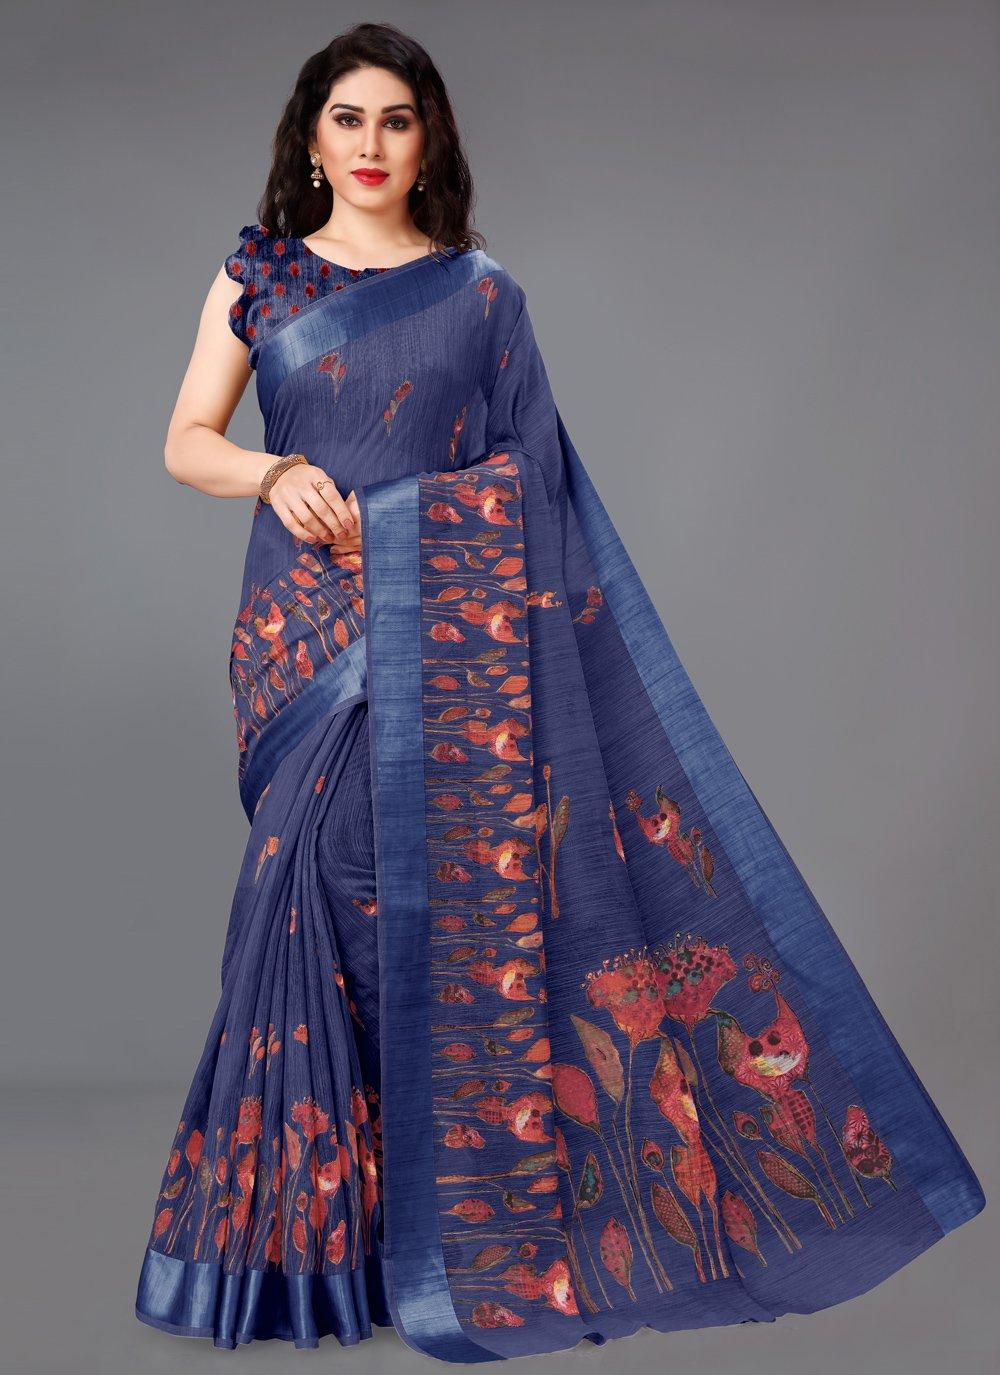 Abstract Print Cotton Blue Printed Saree